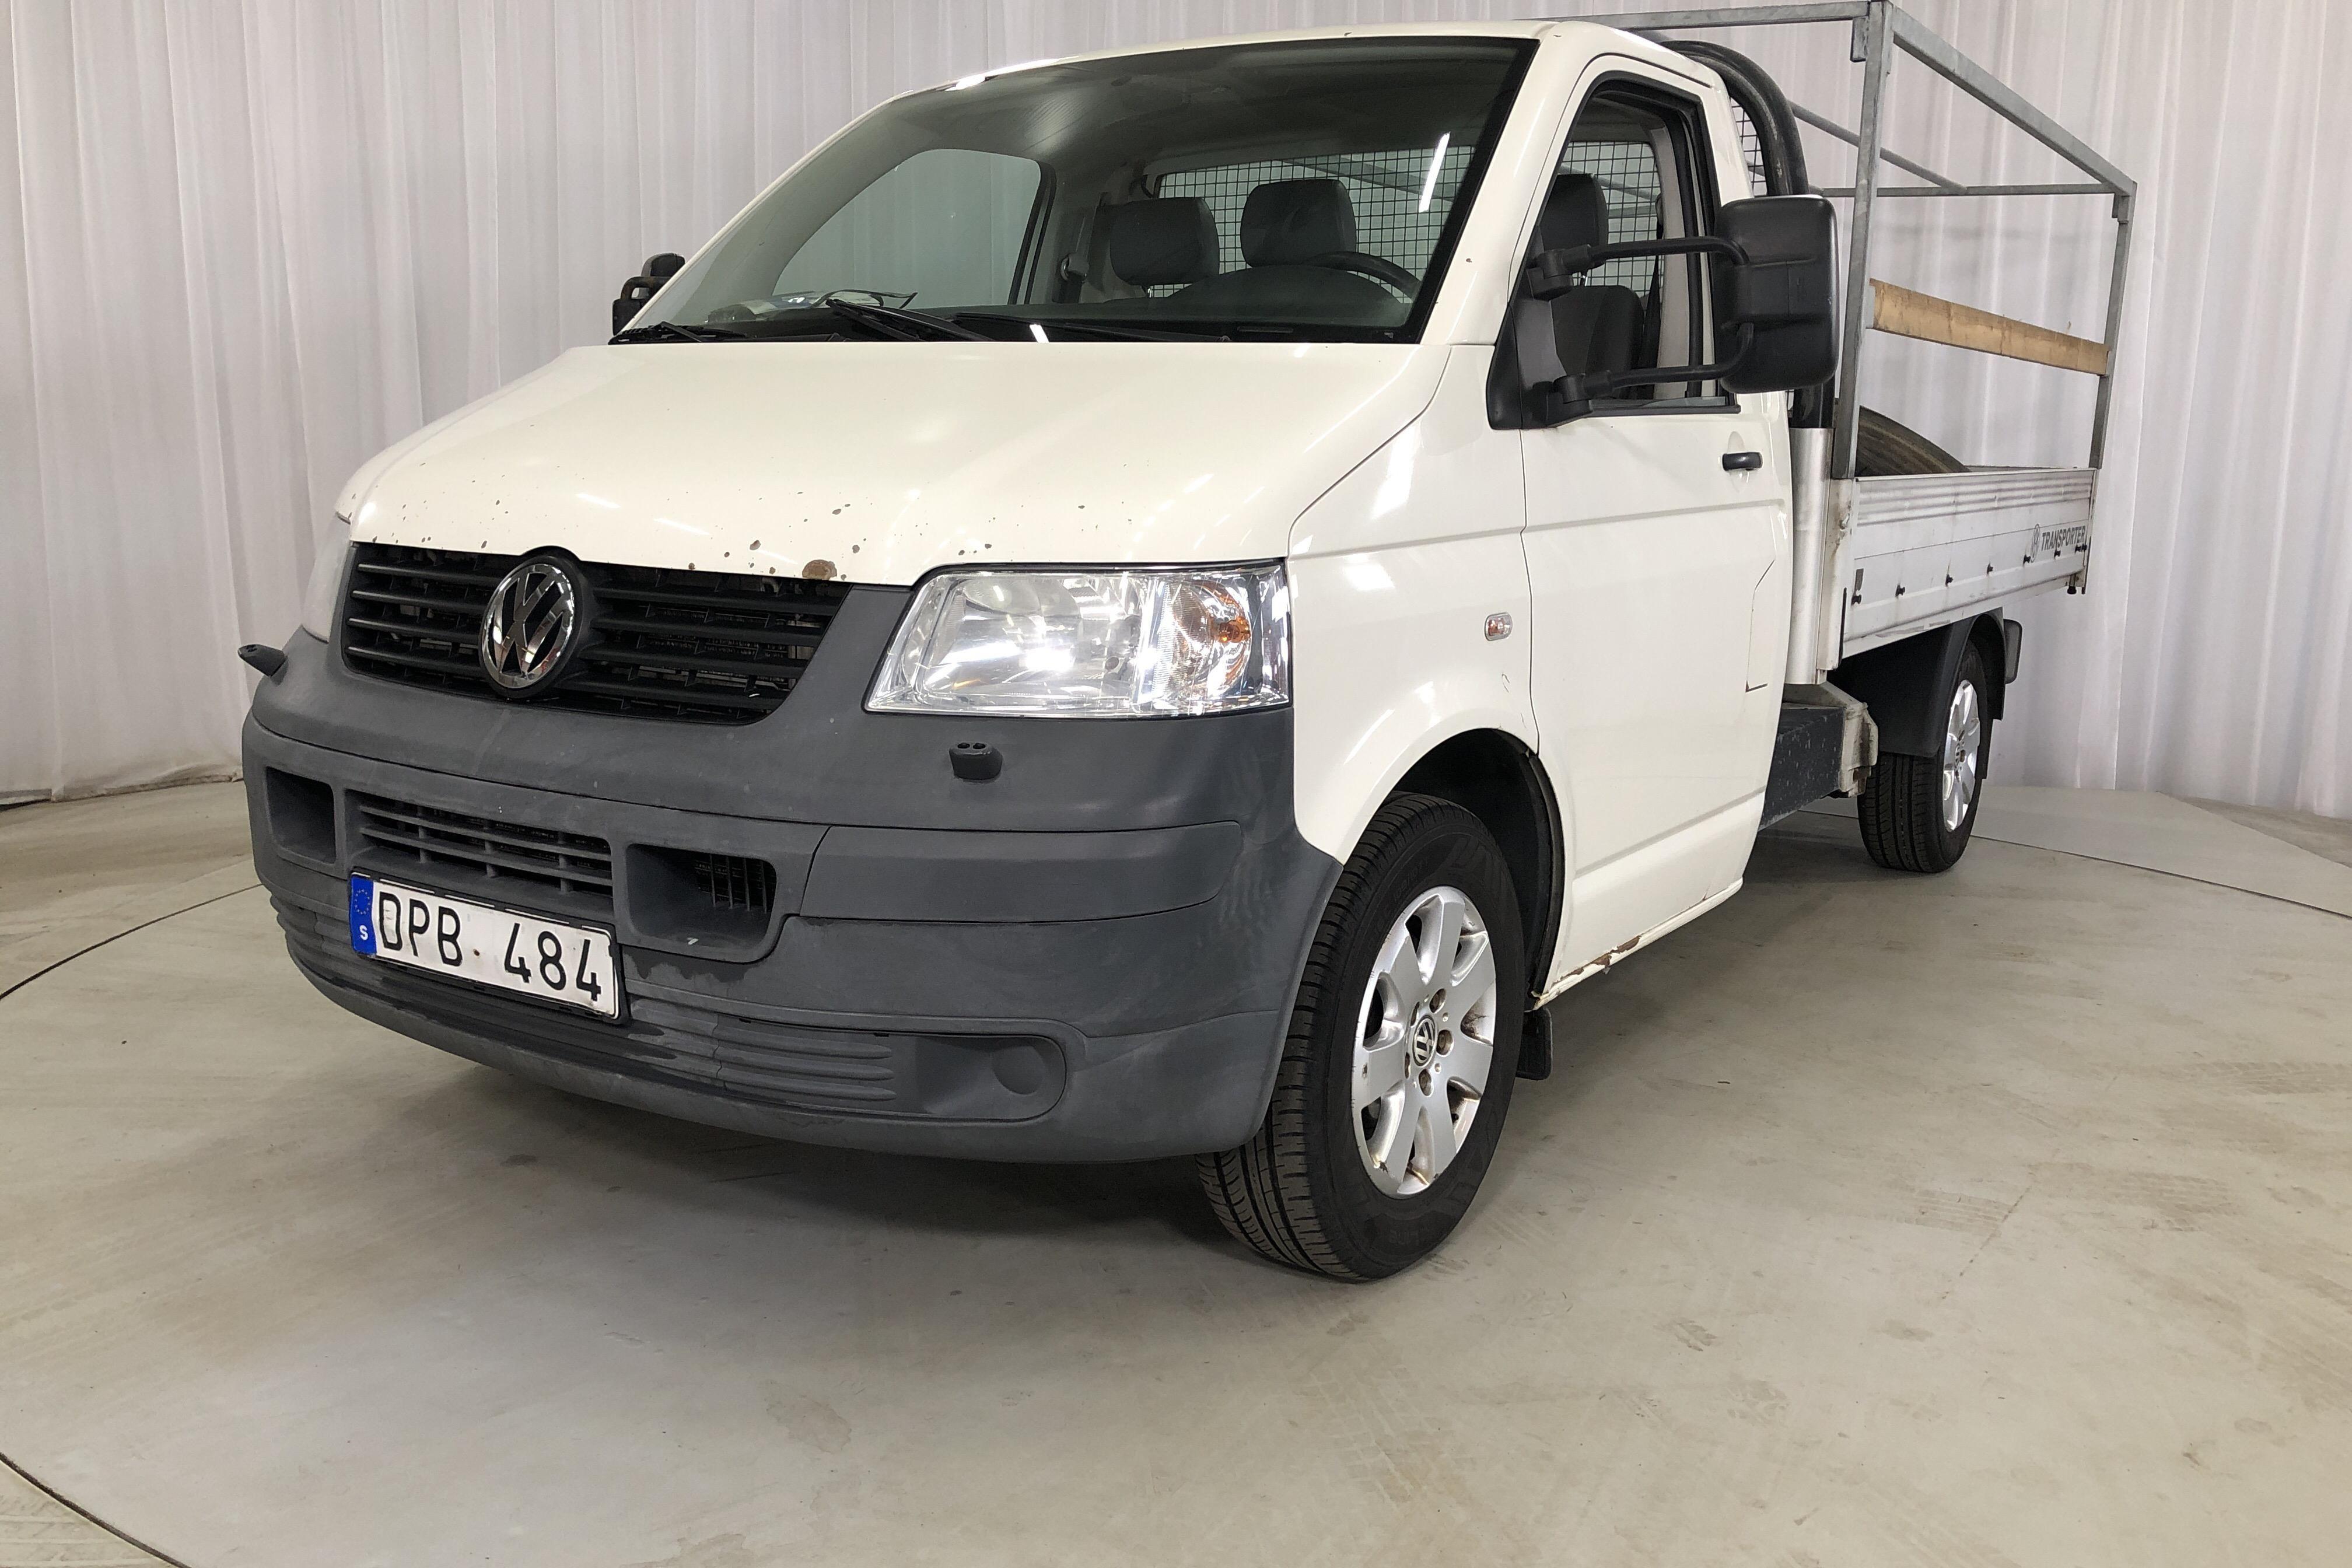 VW Transporter T5 2.5 TDI Pickup (130hk)